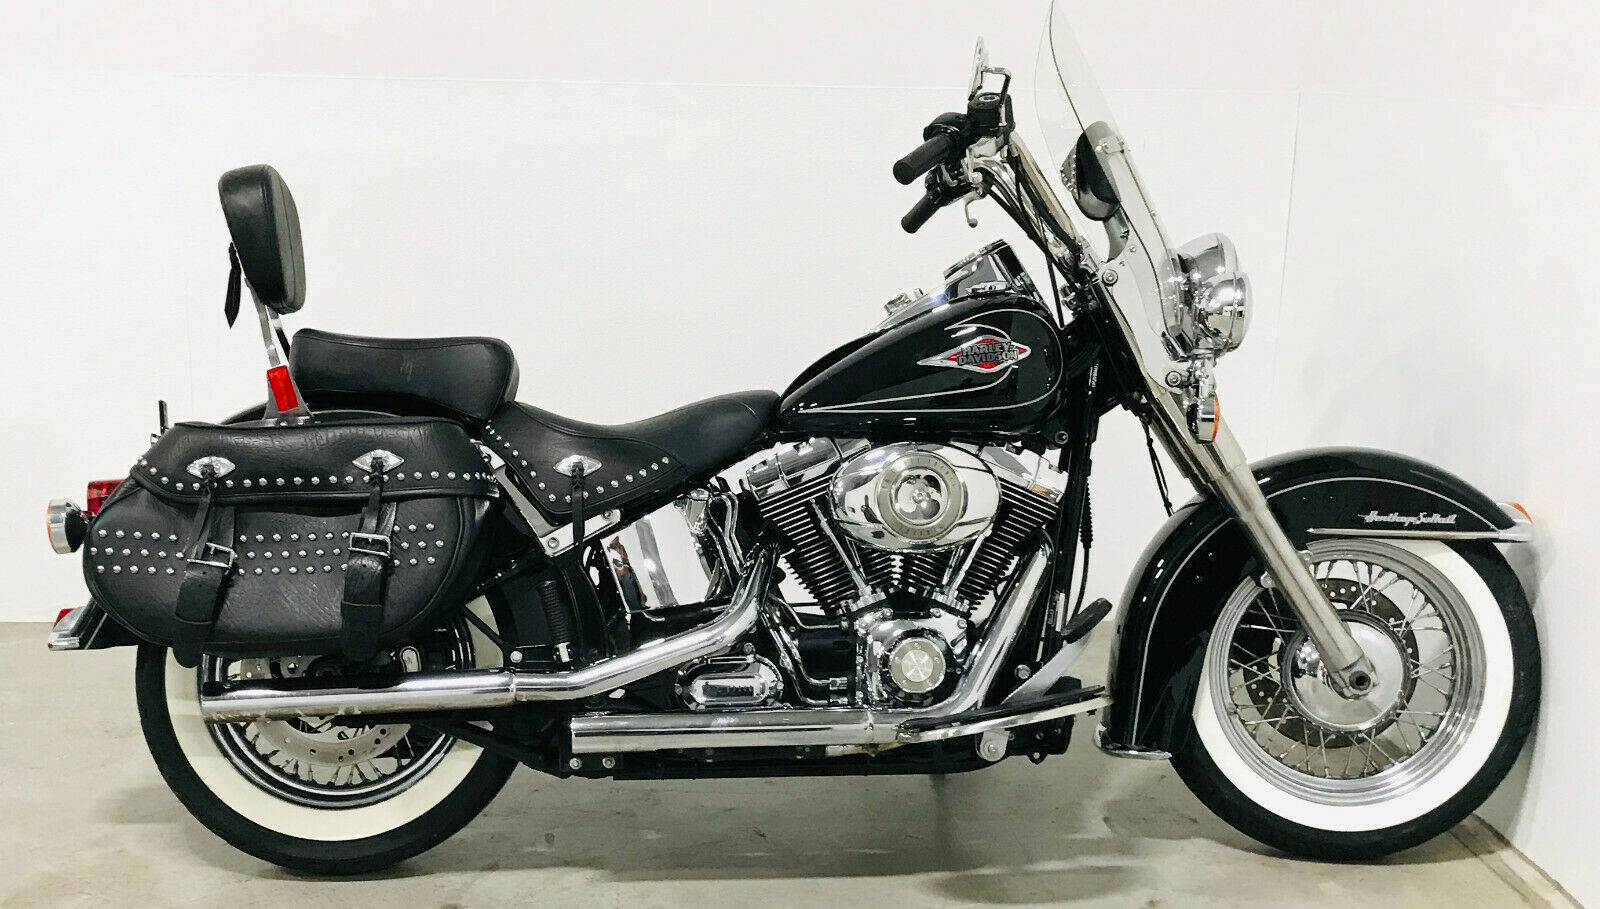 2009 Harley Davidson Heritage Softail FLSTC Classic Vivid Black Whitewalls 6-spd